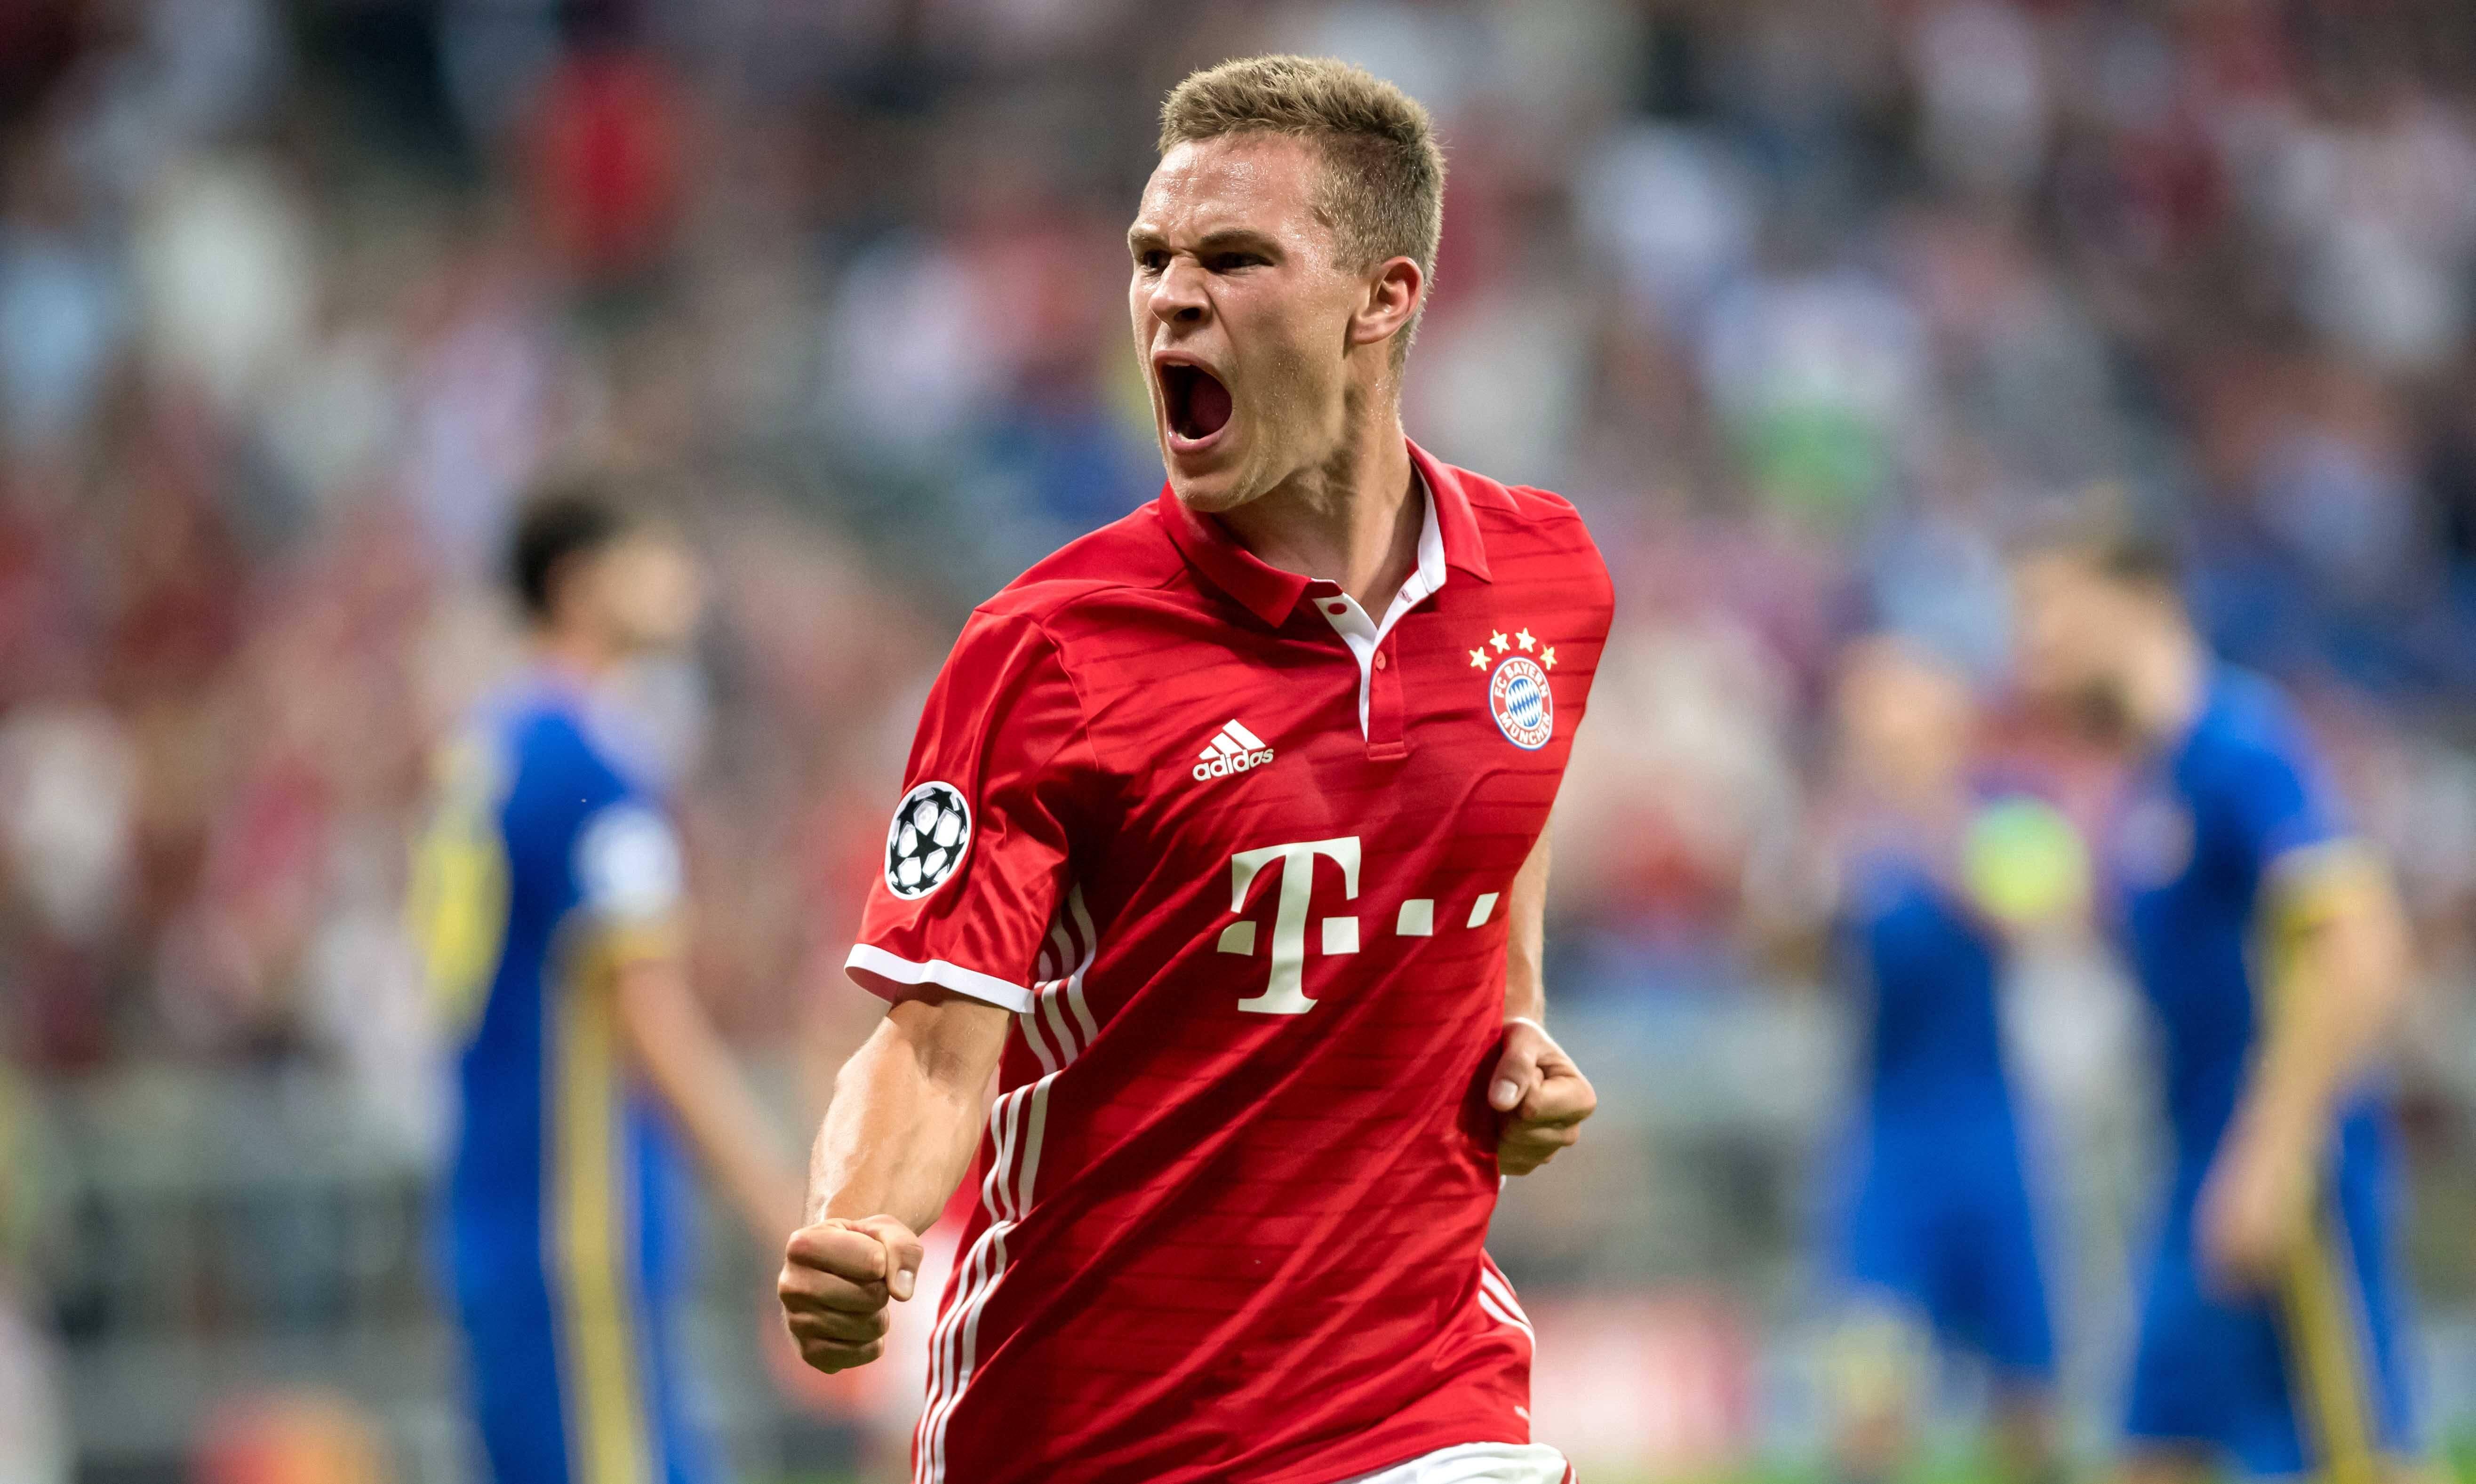 'GER ONLY / NO GALLERY* Joshua Kimmich FC Bayern Rostov 20160913